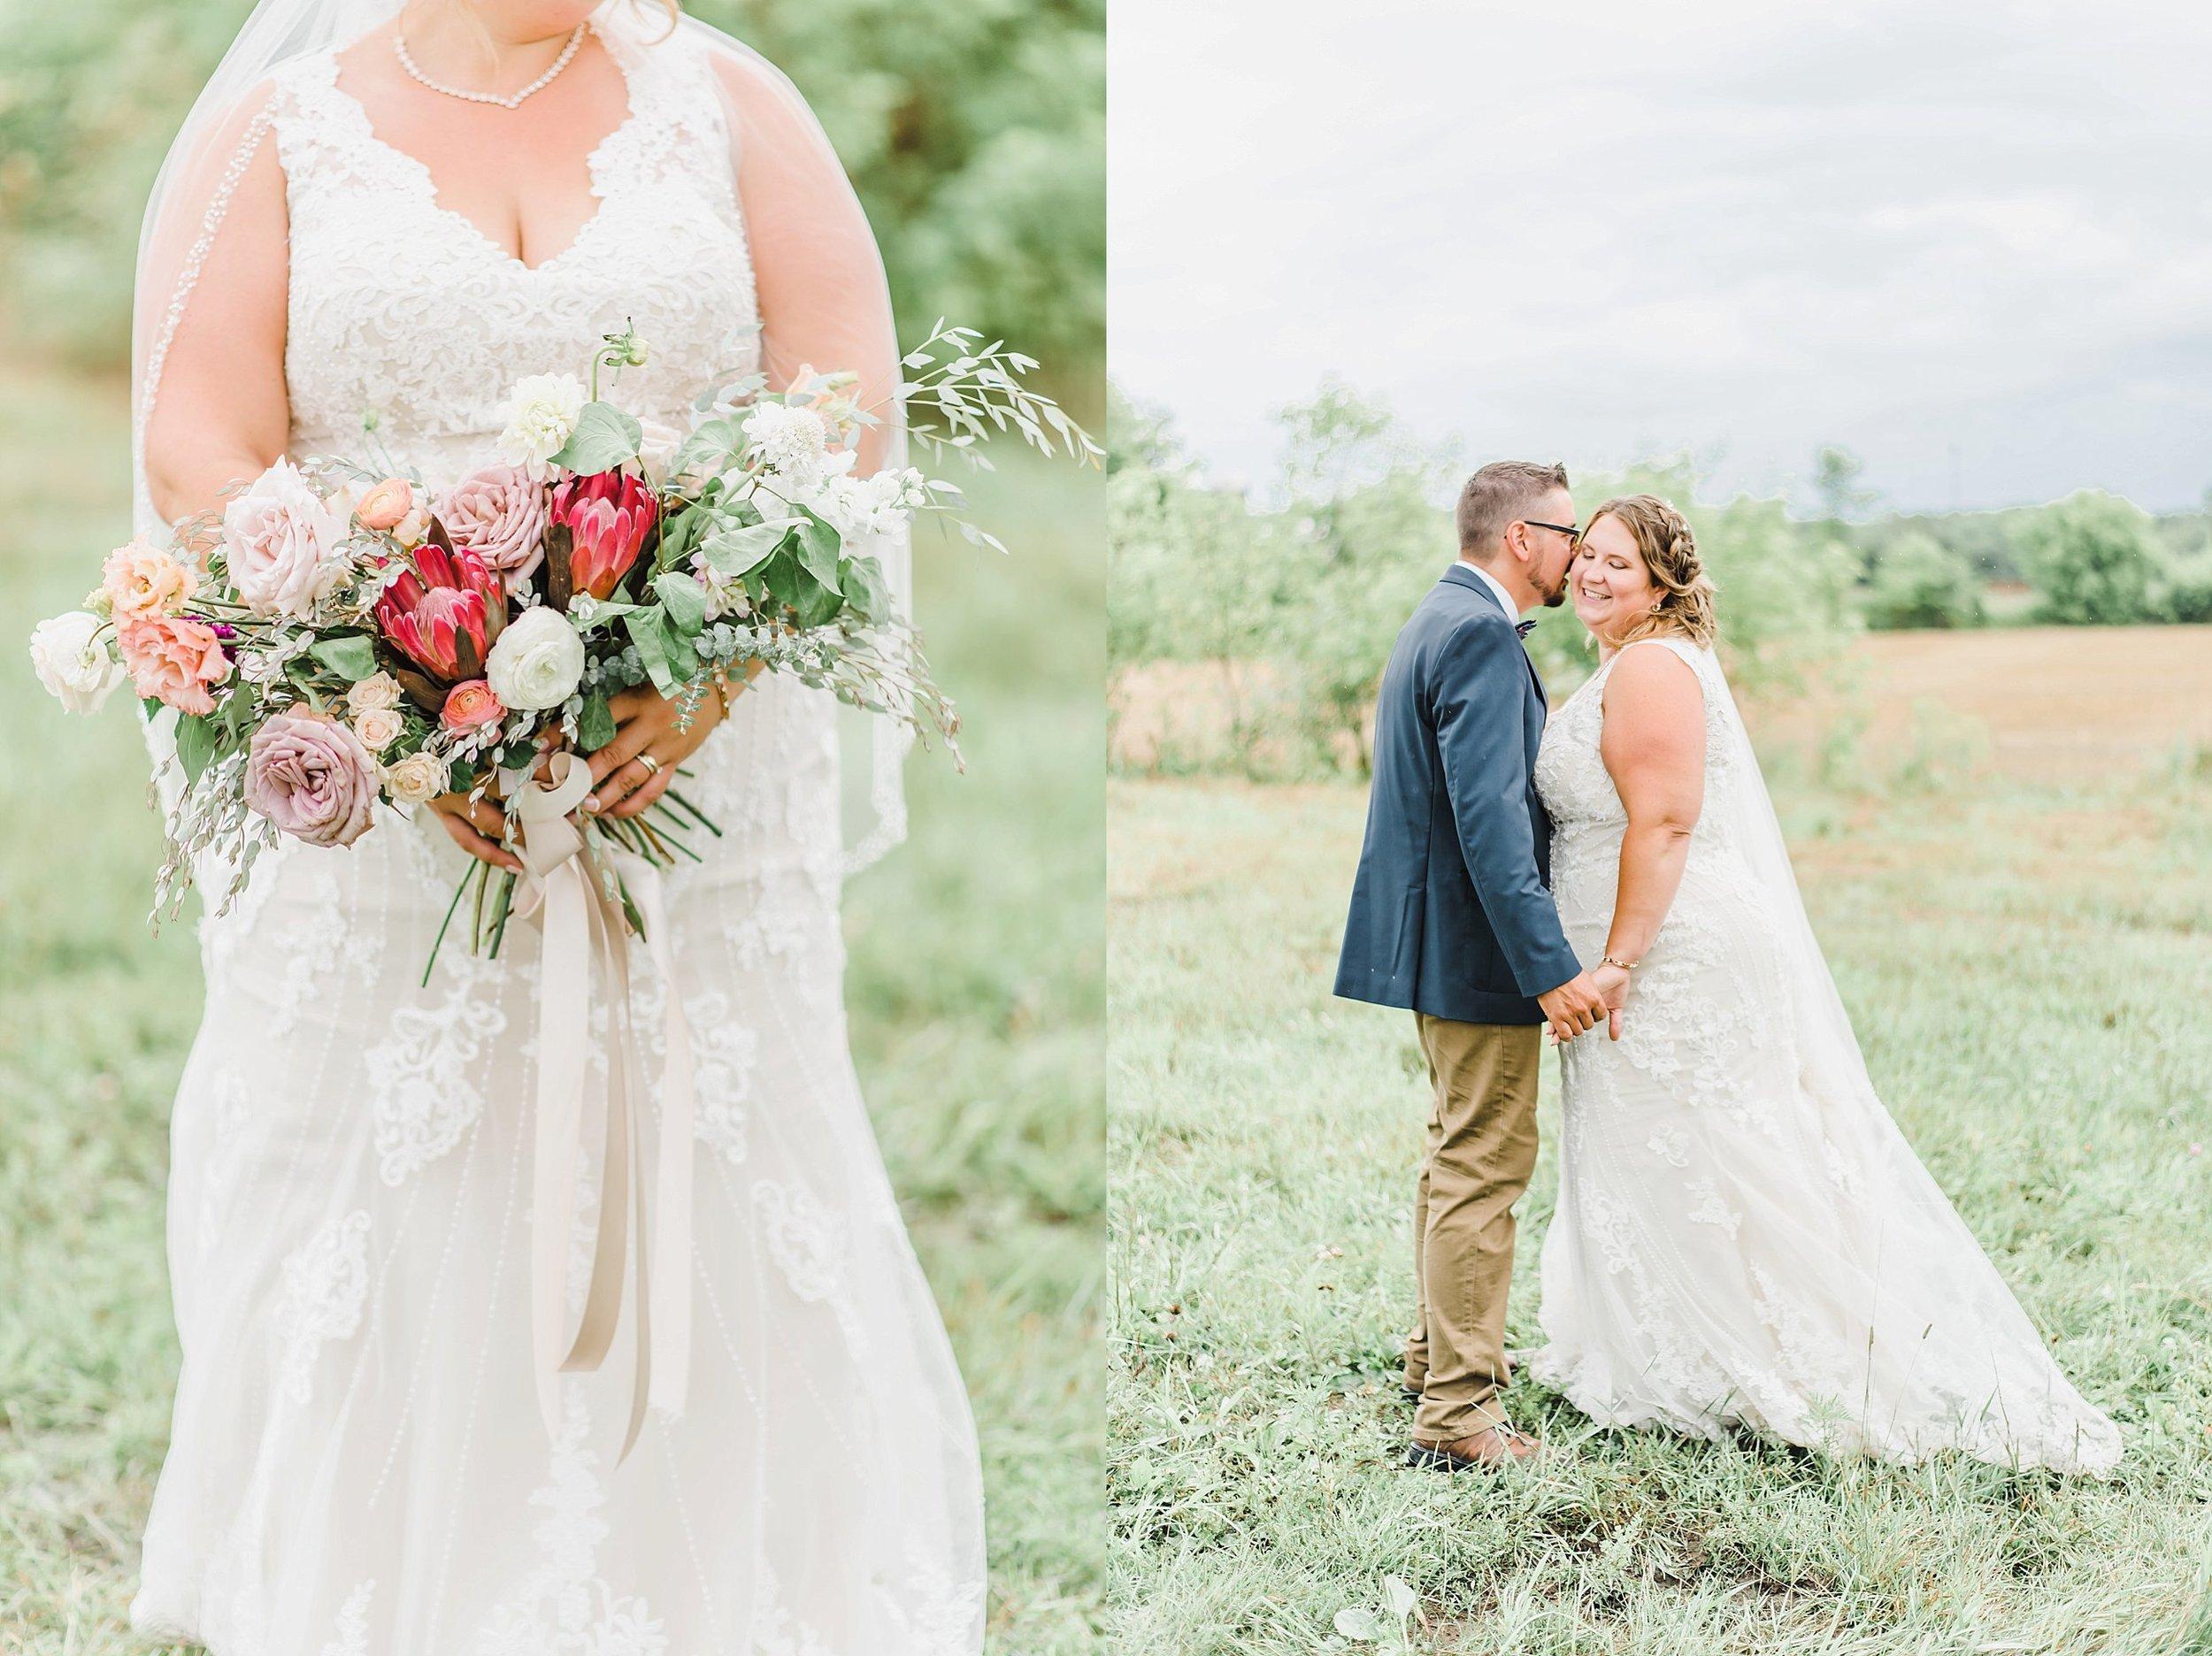 light airy indie fine art ottawa wedding photographer | Ali and Batoul Photography_0406.jpg